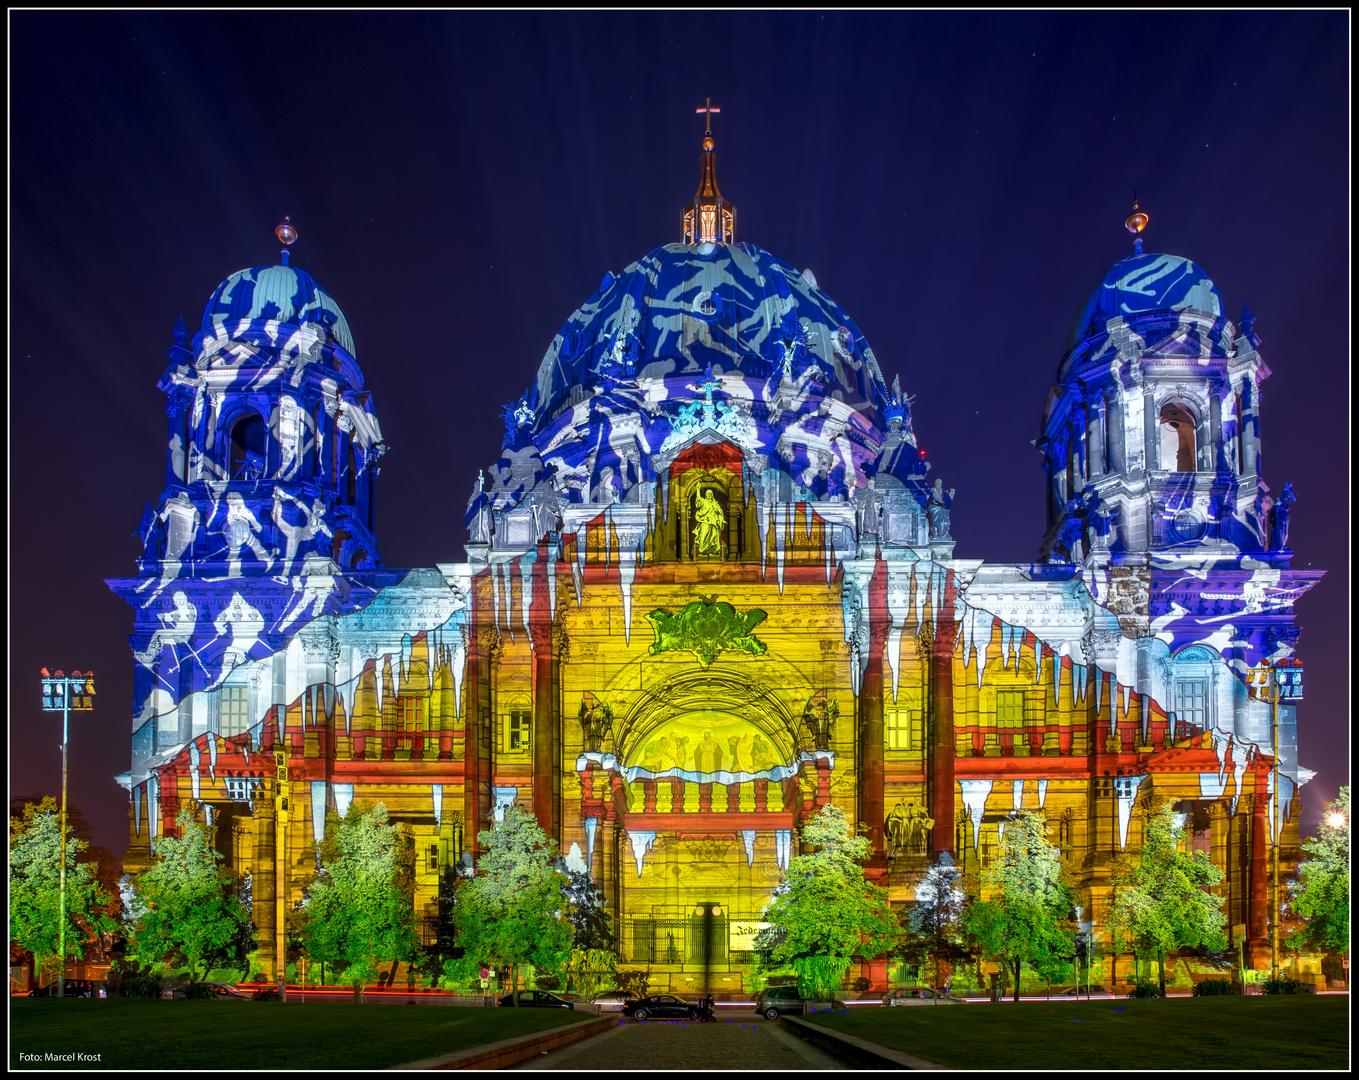 Festival of Lights 2012 Berliner Dom